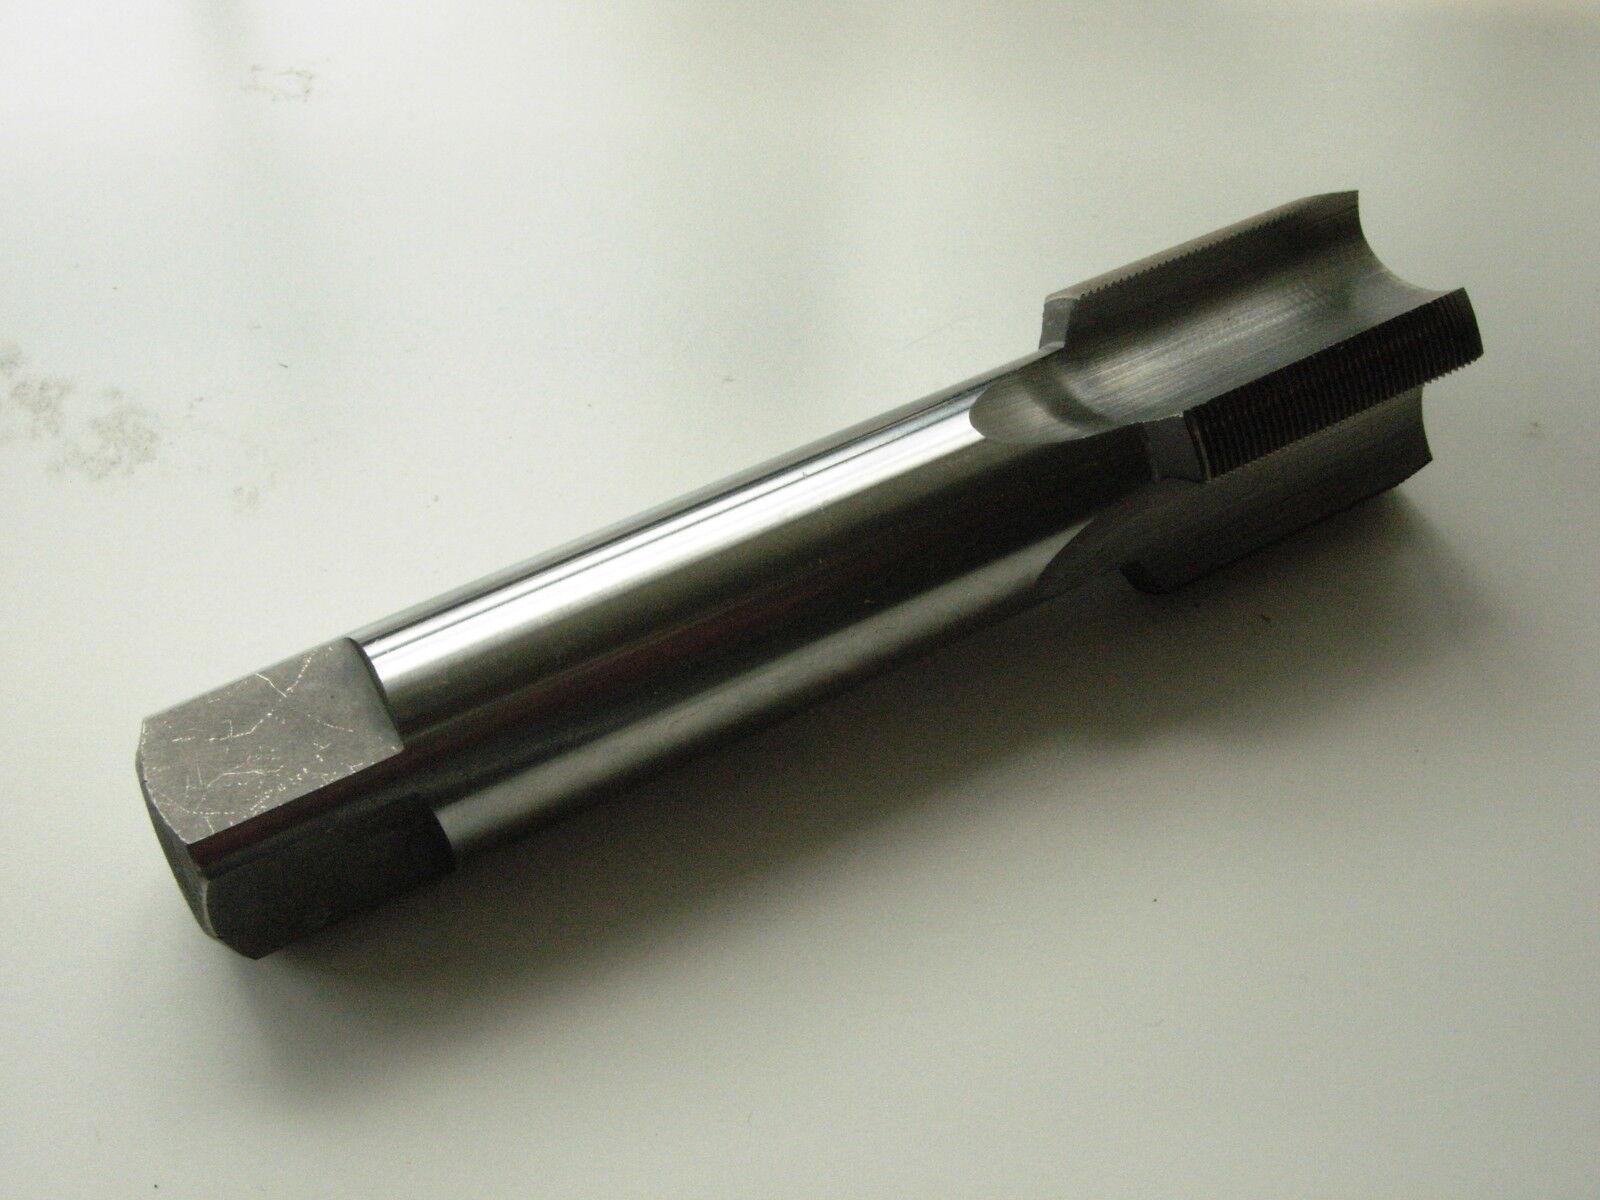 1pc HSS Métrico mano derecha derecha derecha Tap M95 X 2.0mm grifos de Herramientas de subprocesos 95mm X 2mm Pitch 4ad9ab